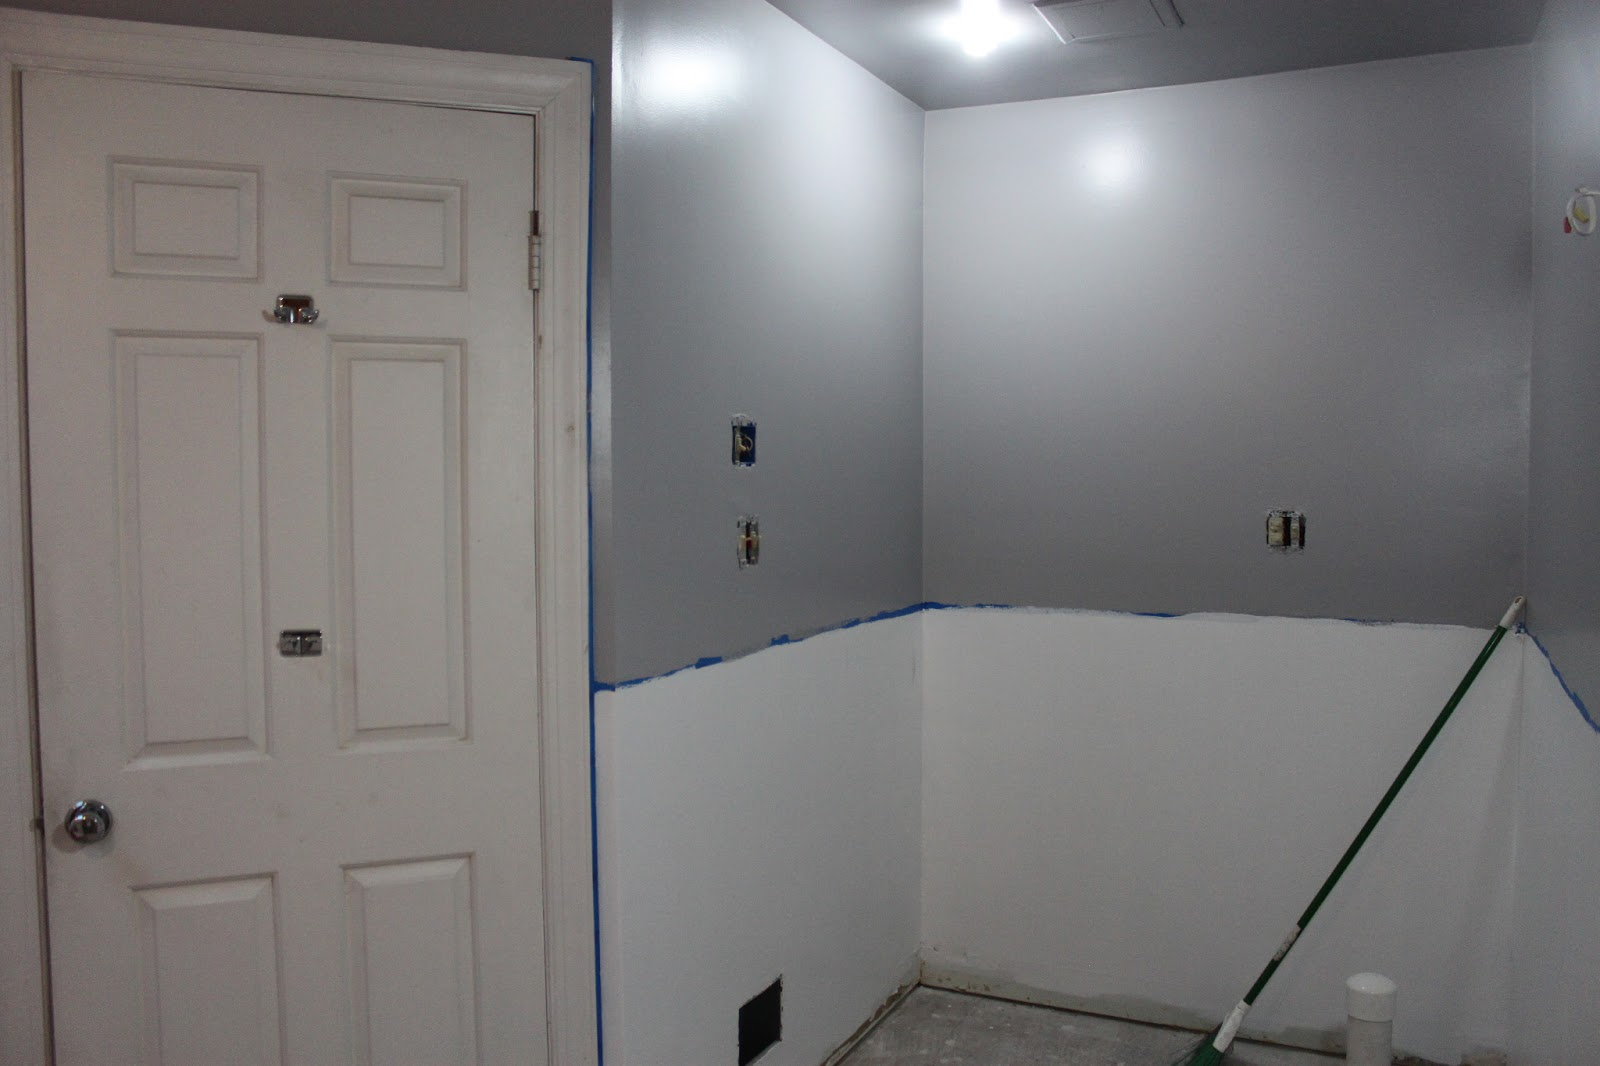 Pat S Addition Renovation Bathroom Paint Progress